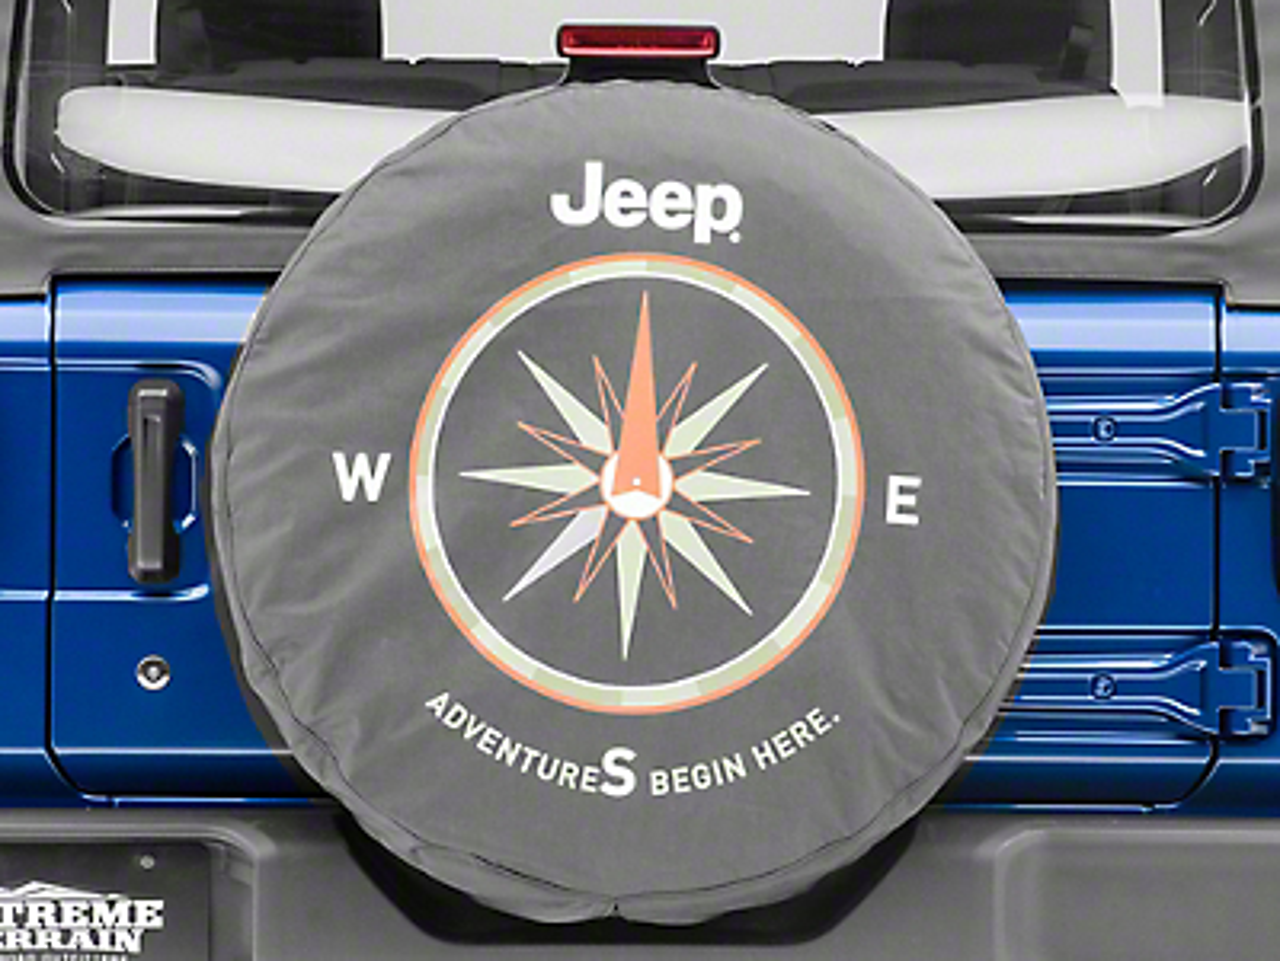 Mopar Adventures Begin Here Spare Tire Cover - Denim (87-18 Jeep Wrangler YJ, TJ, JK & JL)